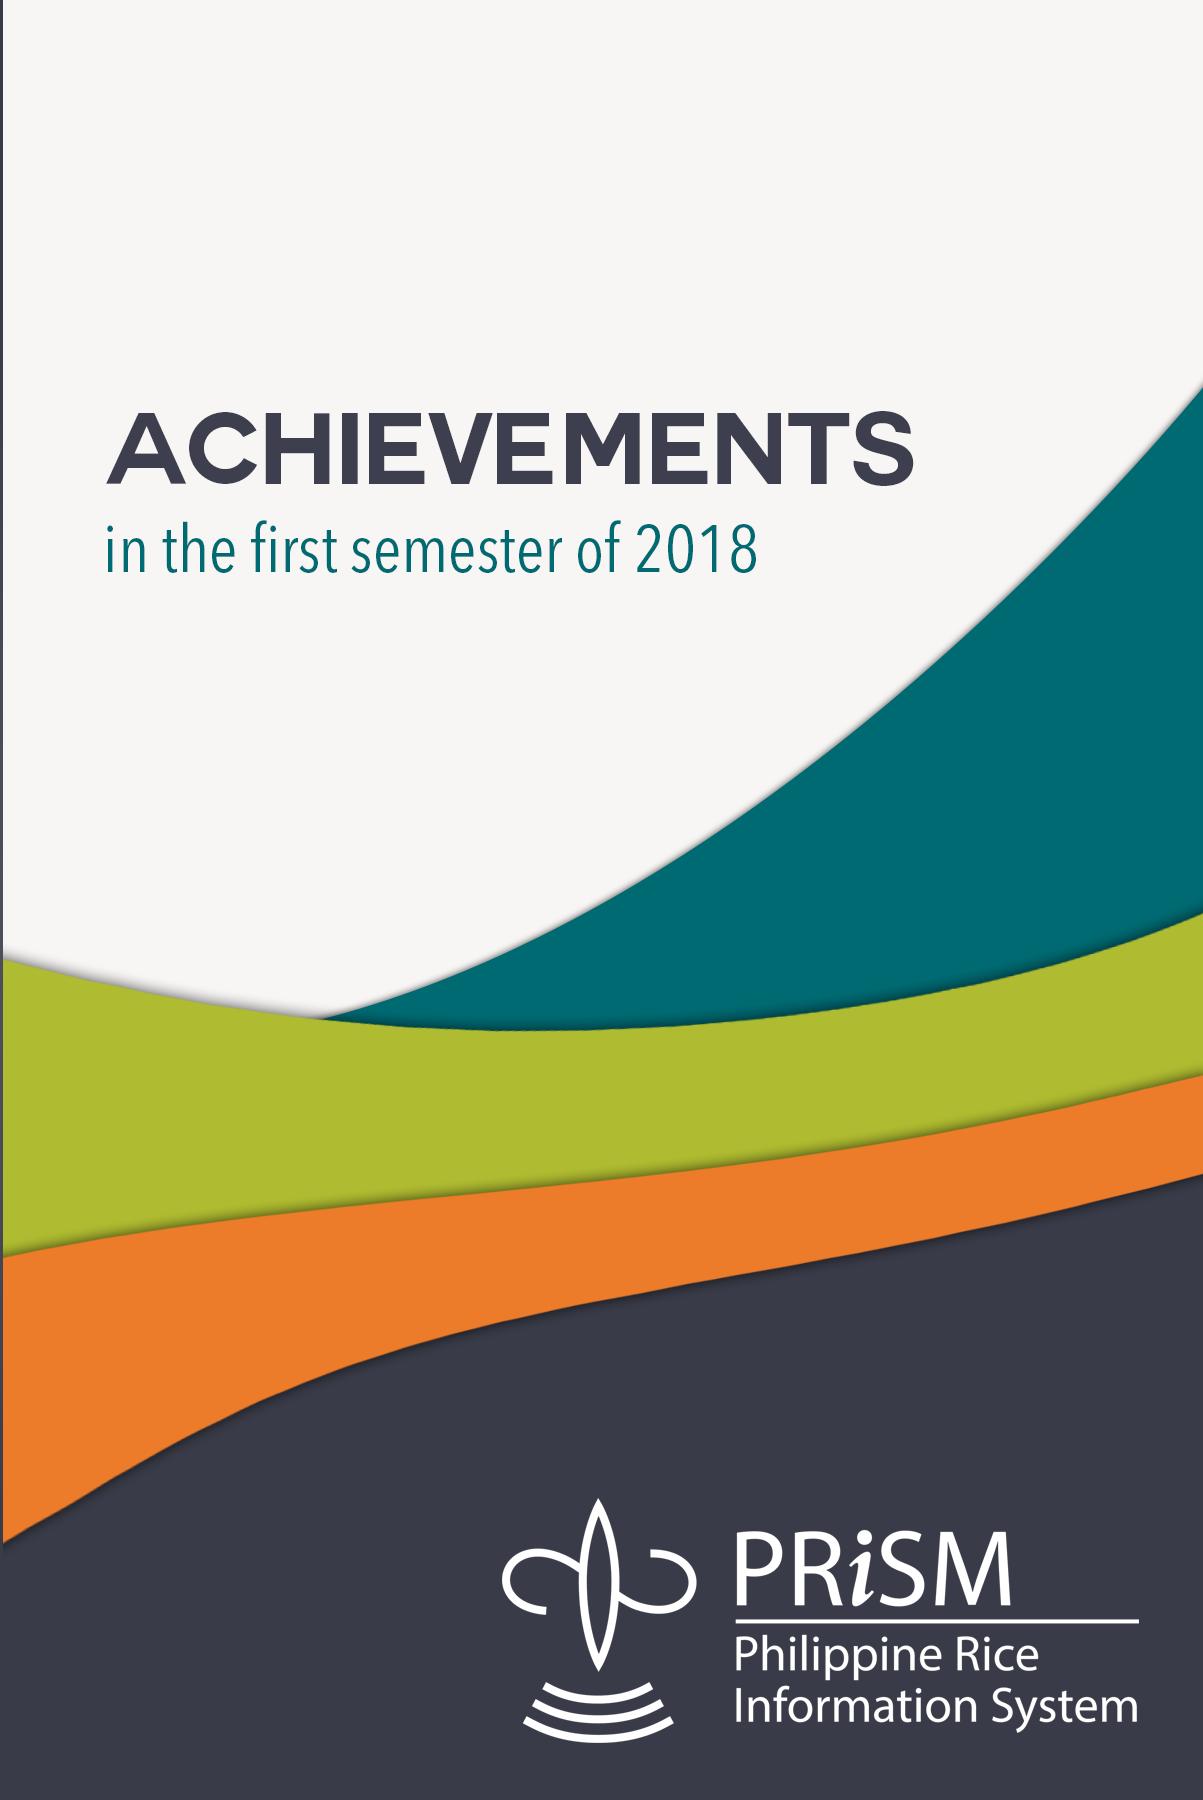 2018 - 1st Semester